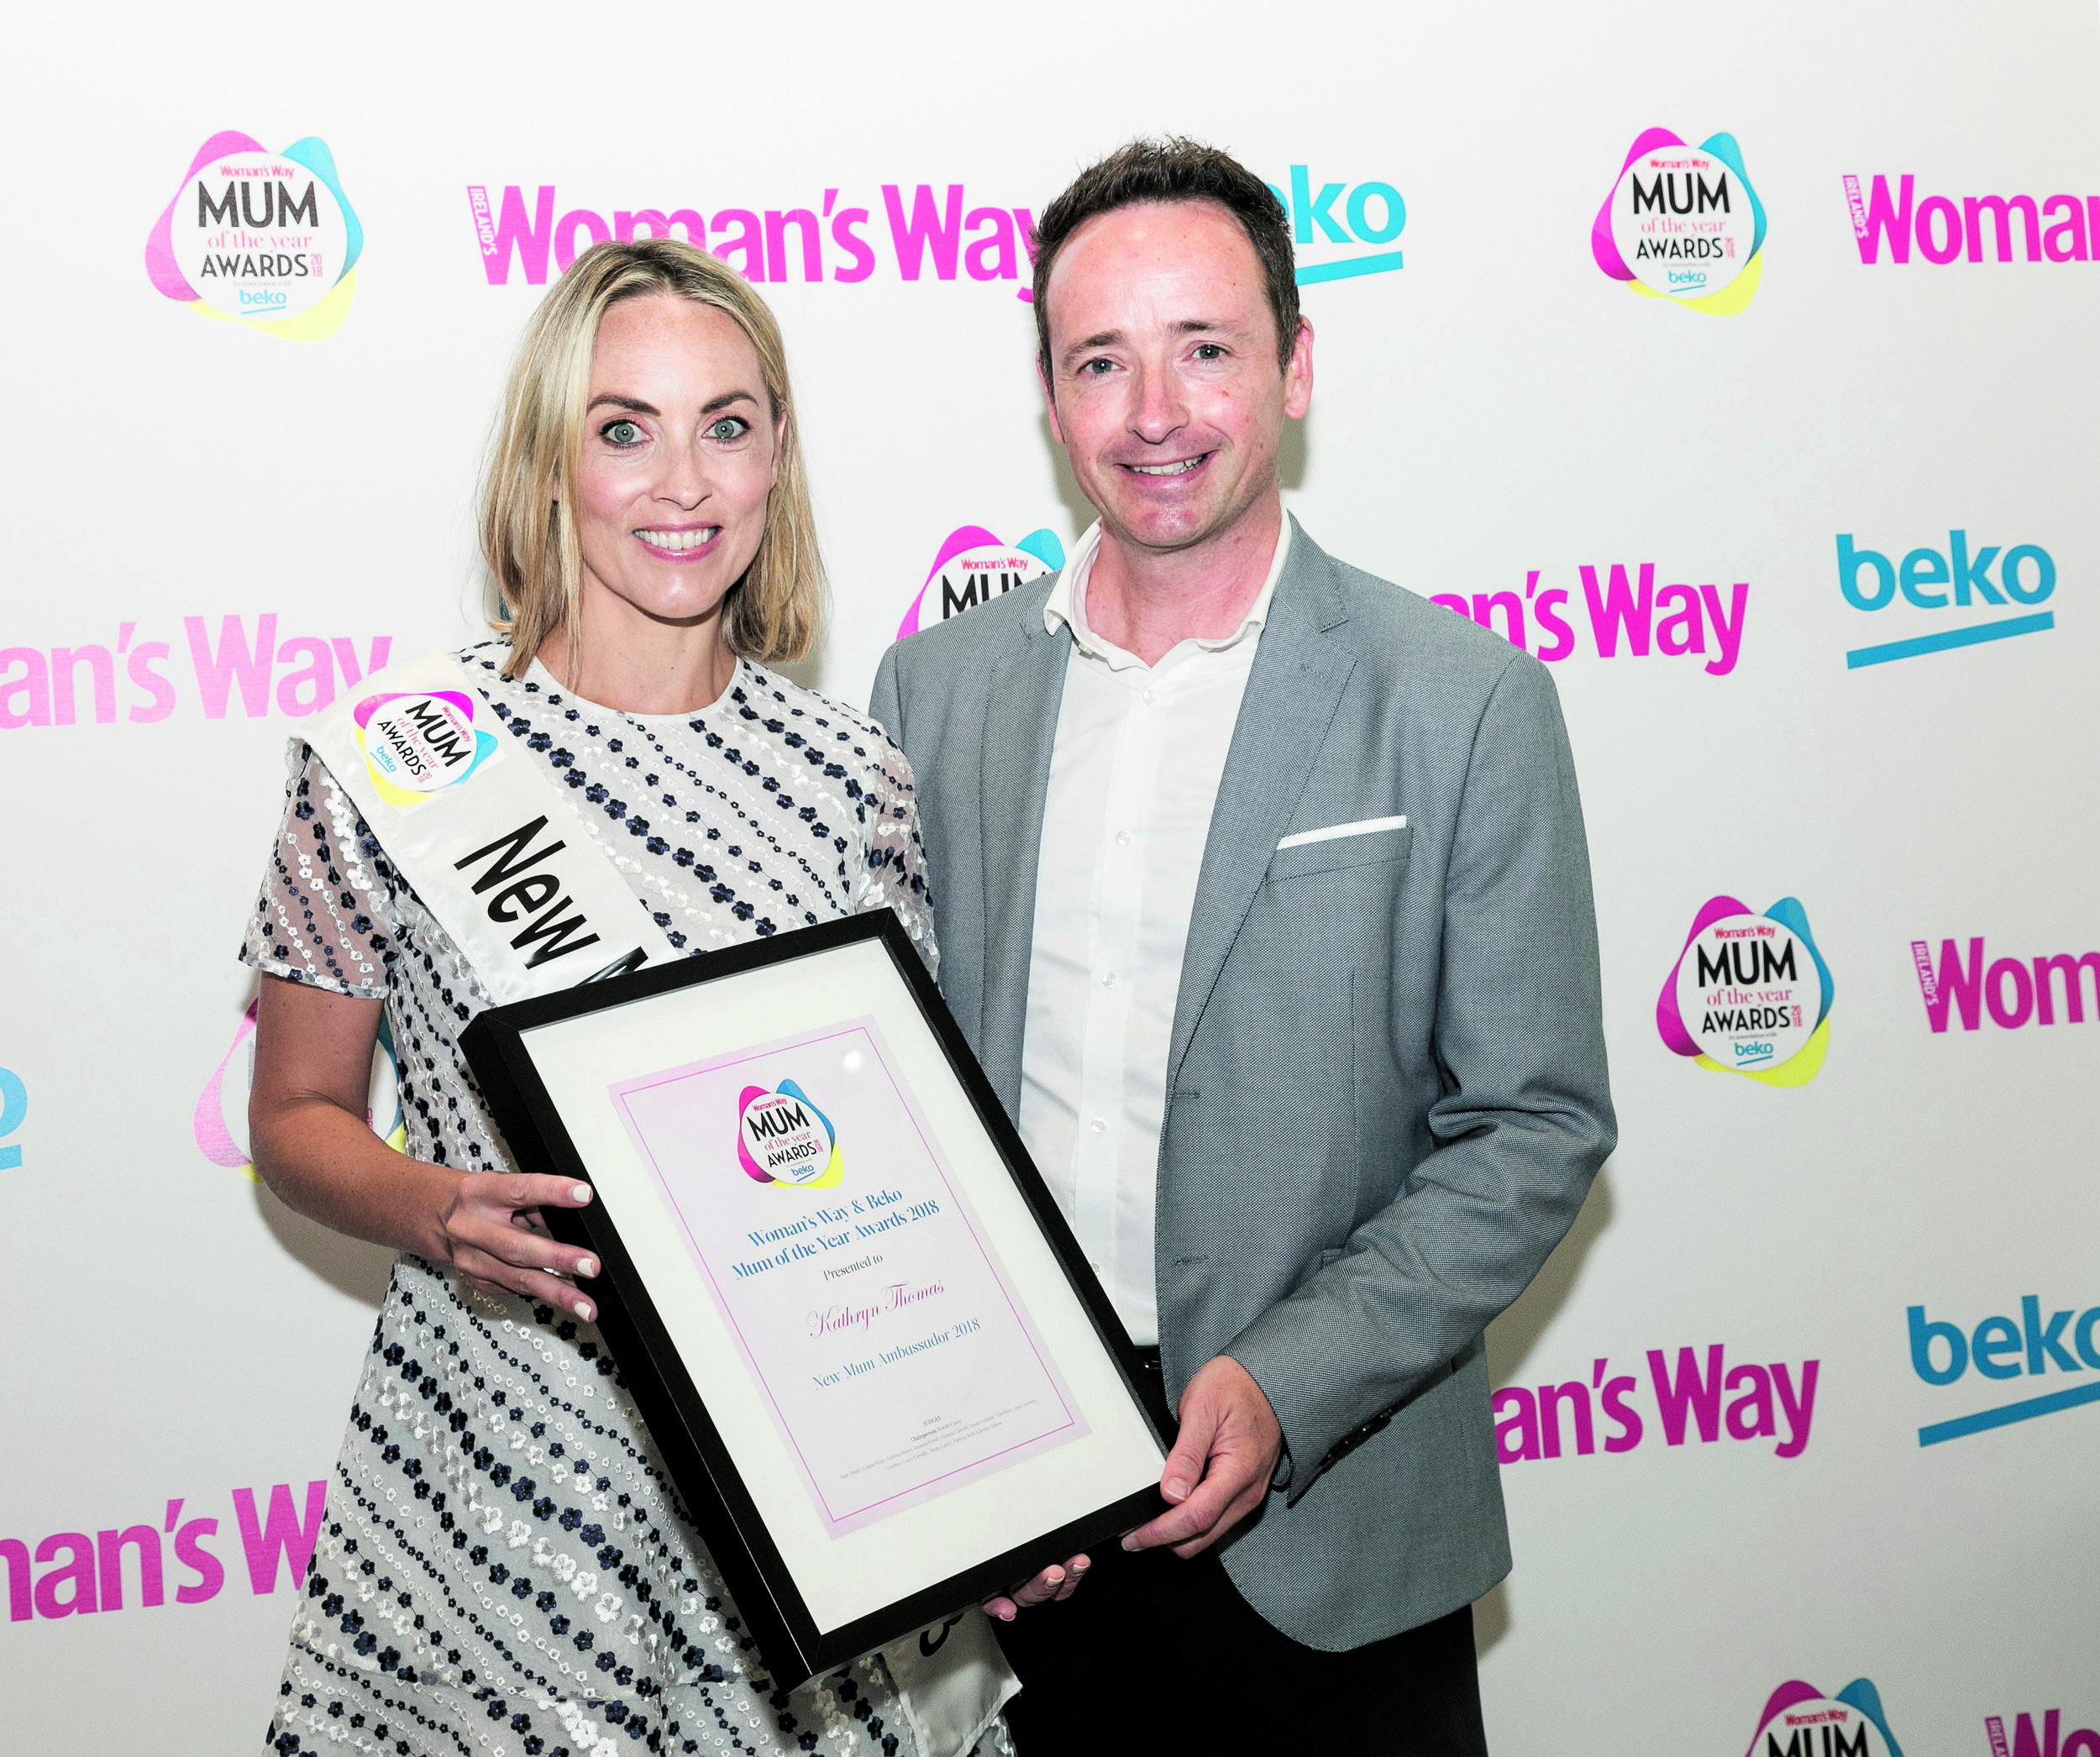 Ian pictured with New Mum Ambassador Kathryn Thomas